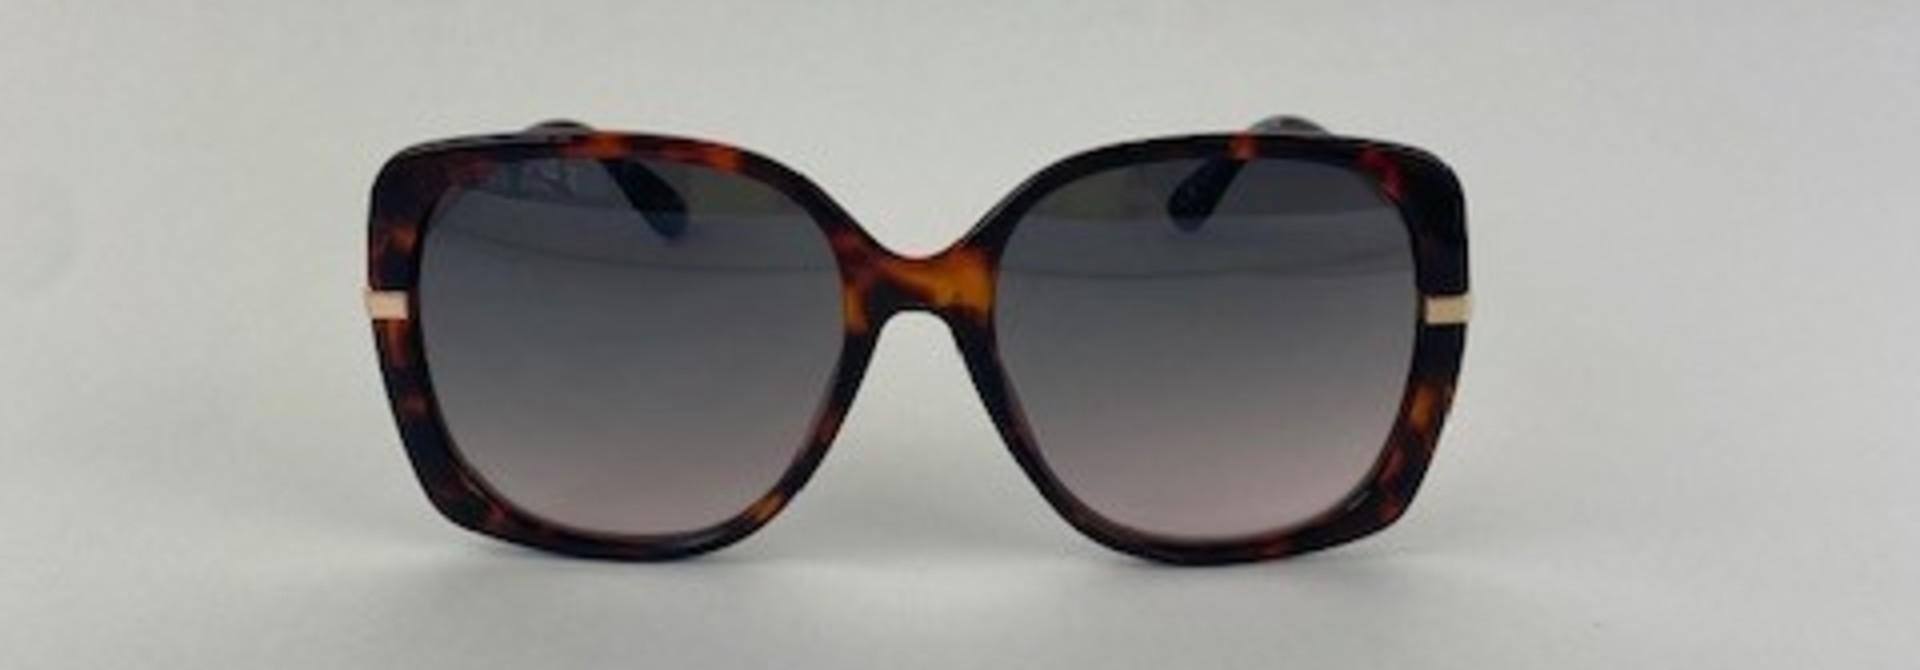 Jü-Jü sunglasses Havana